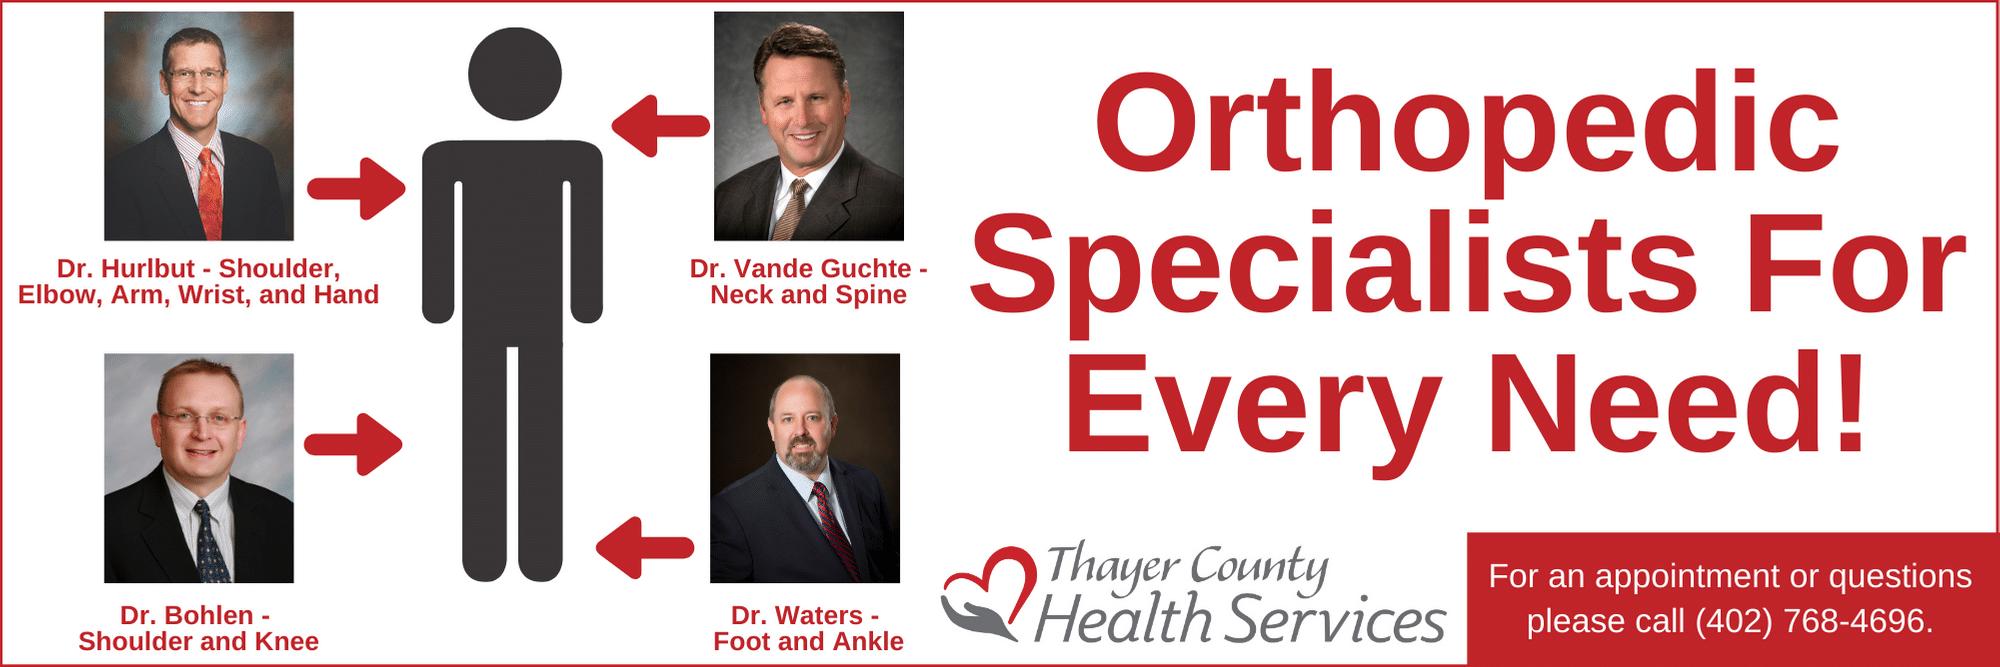 Orthopedic Specialists